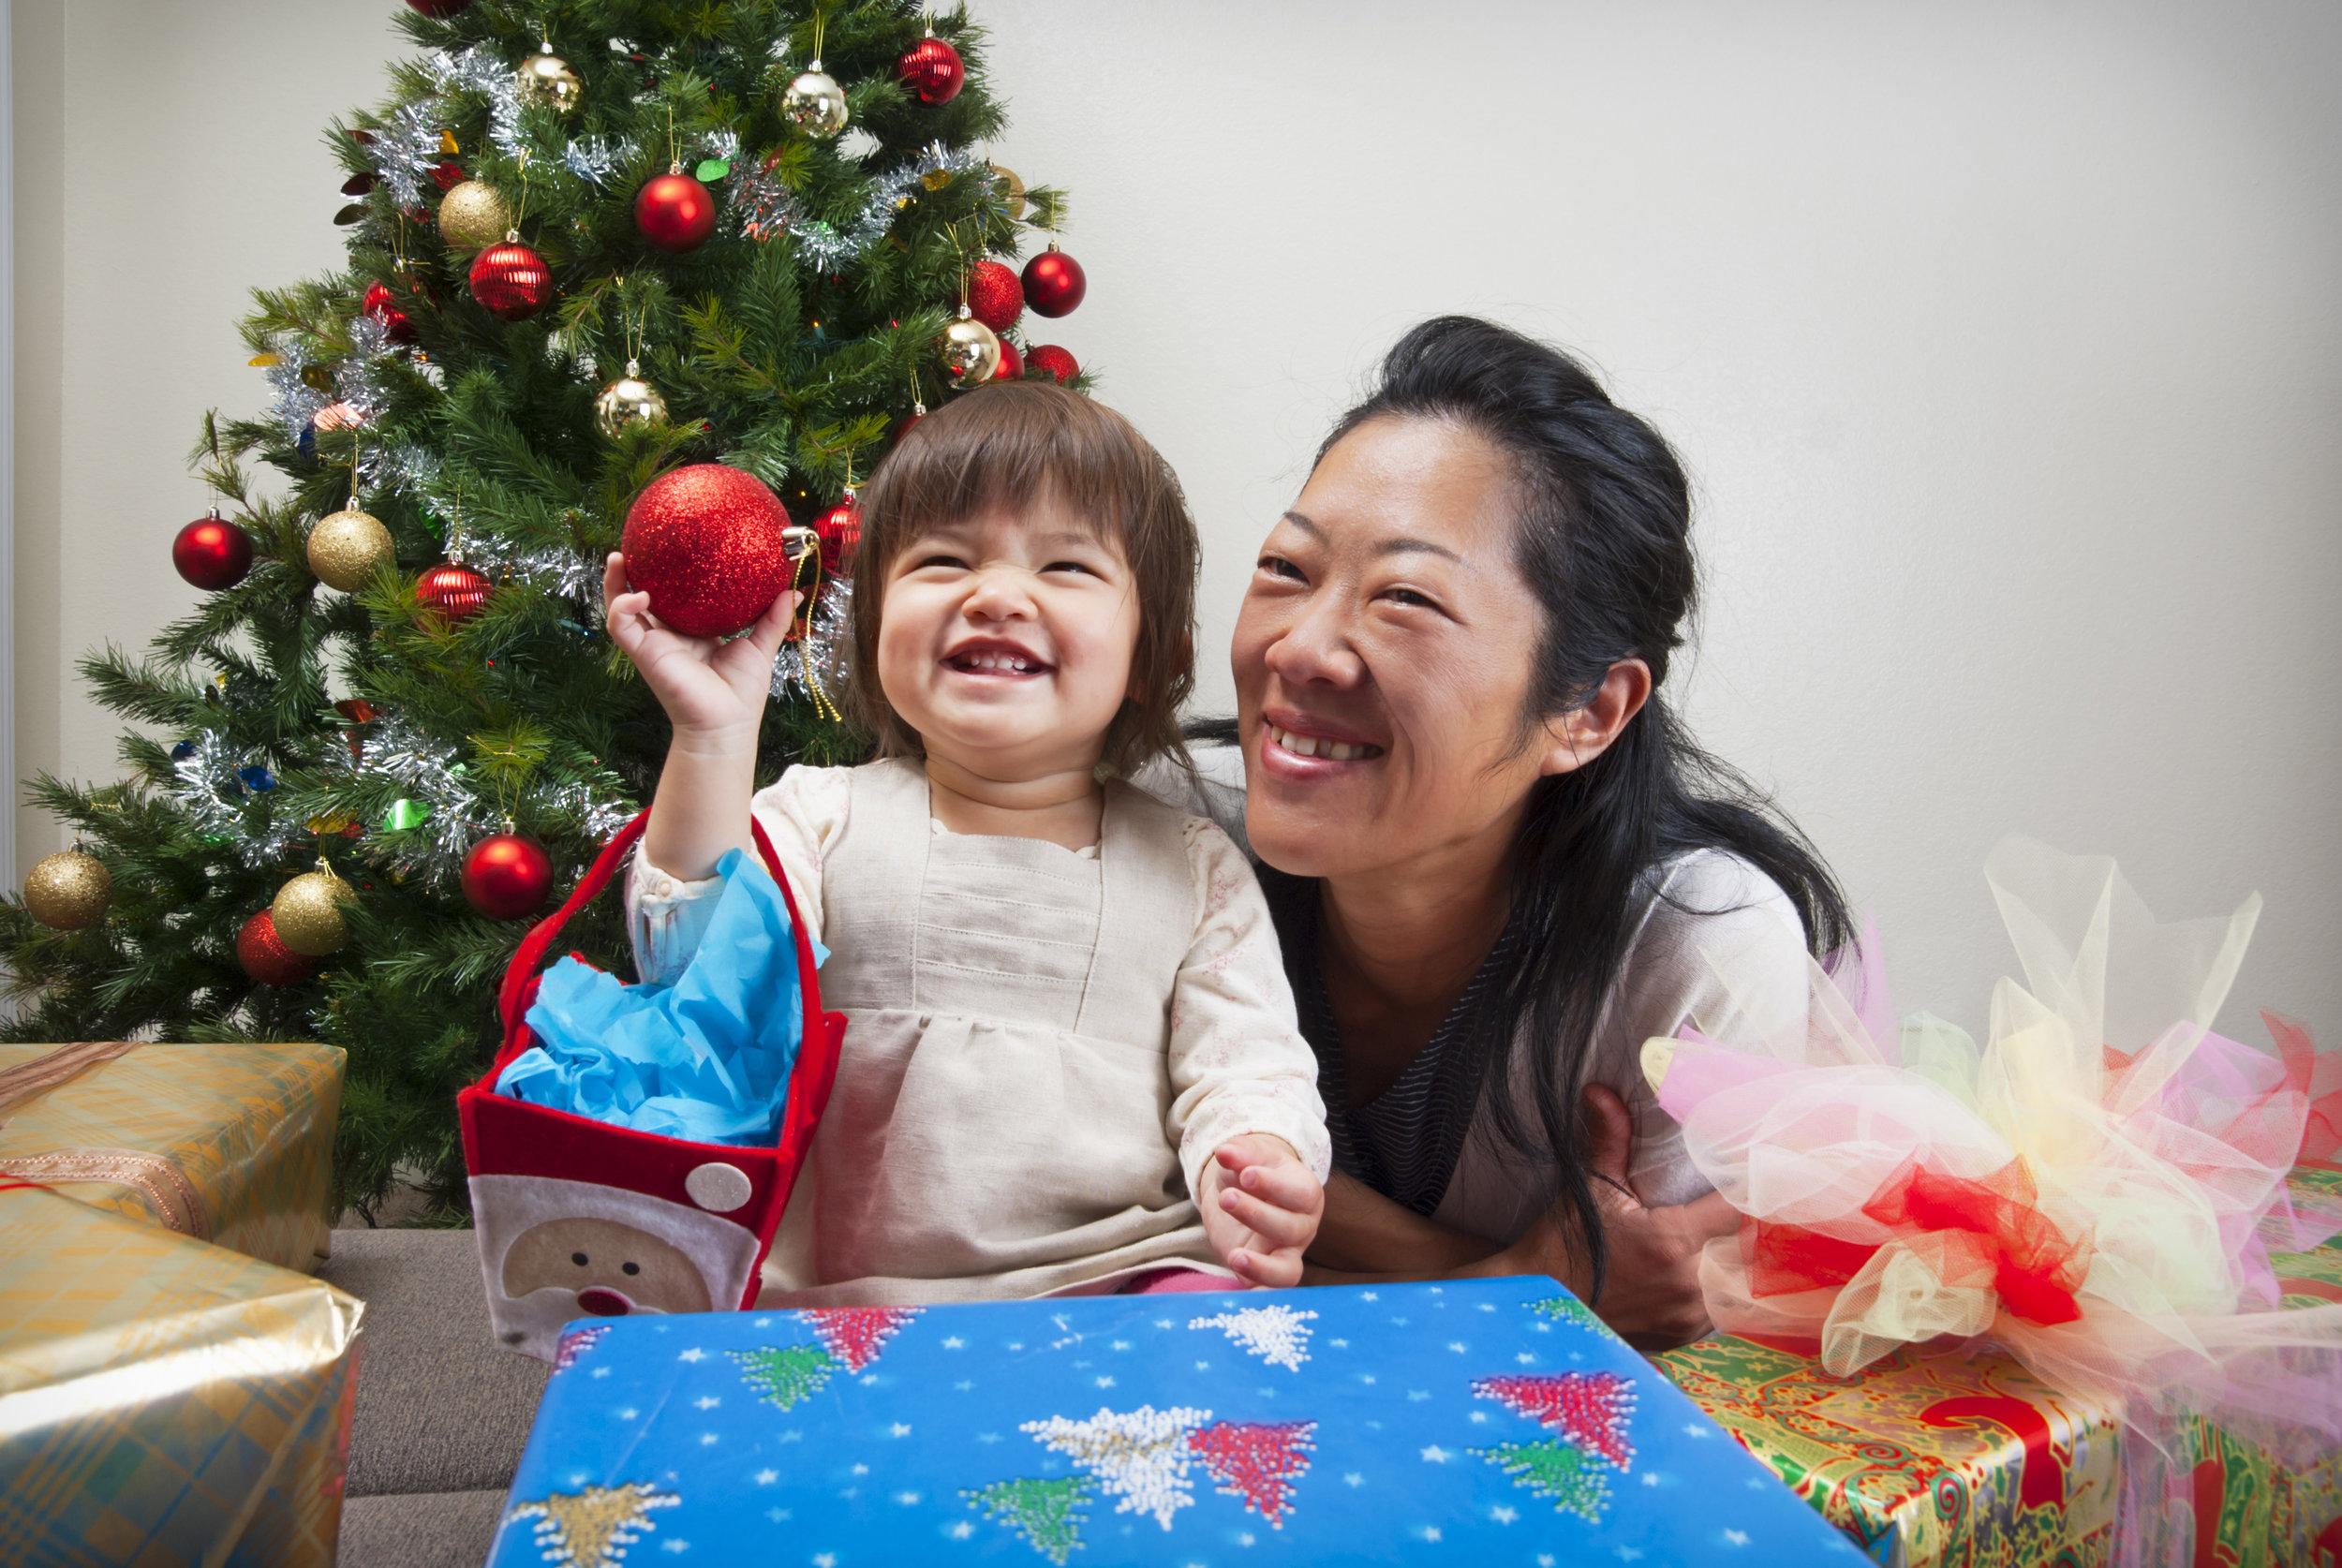 christmas-tree-gift_18532904_LARGE.jpg